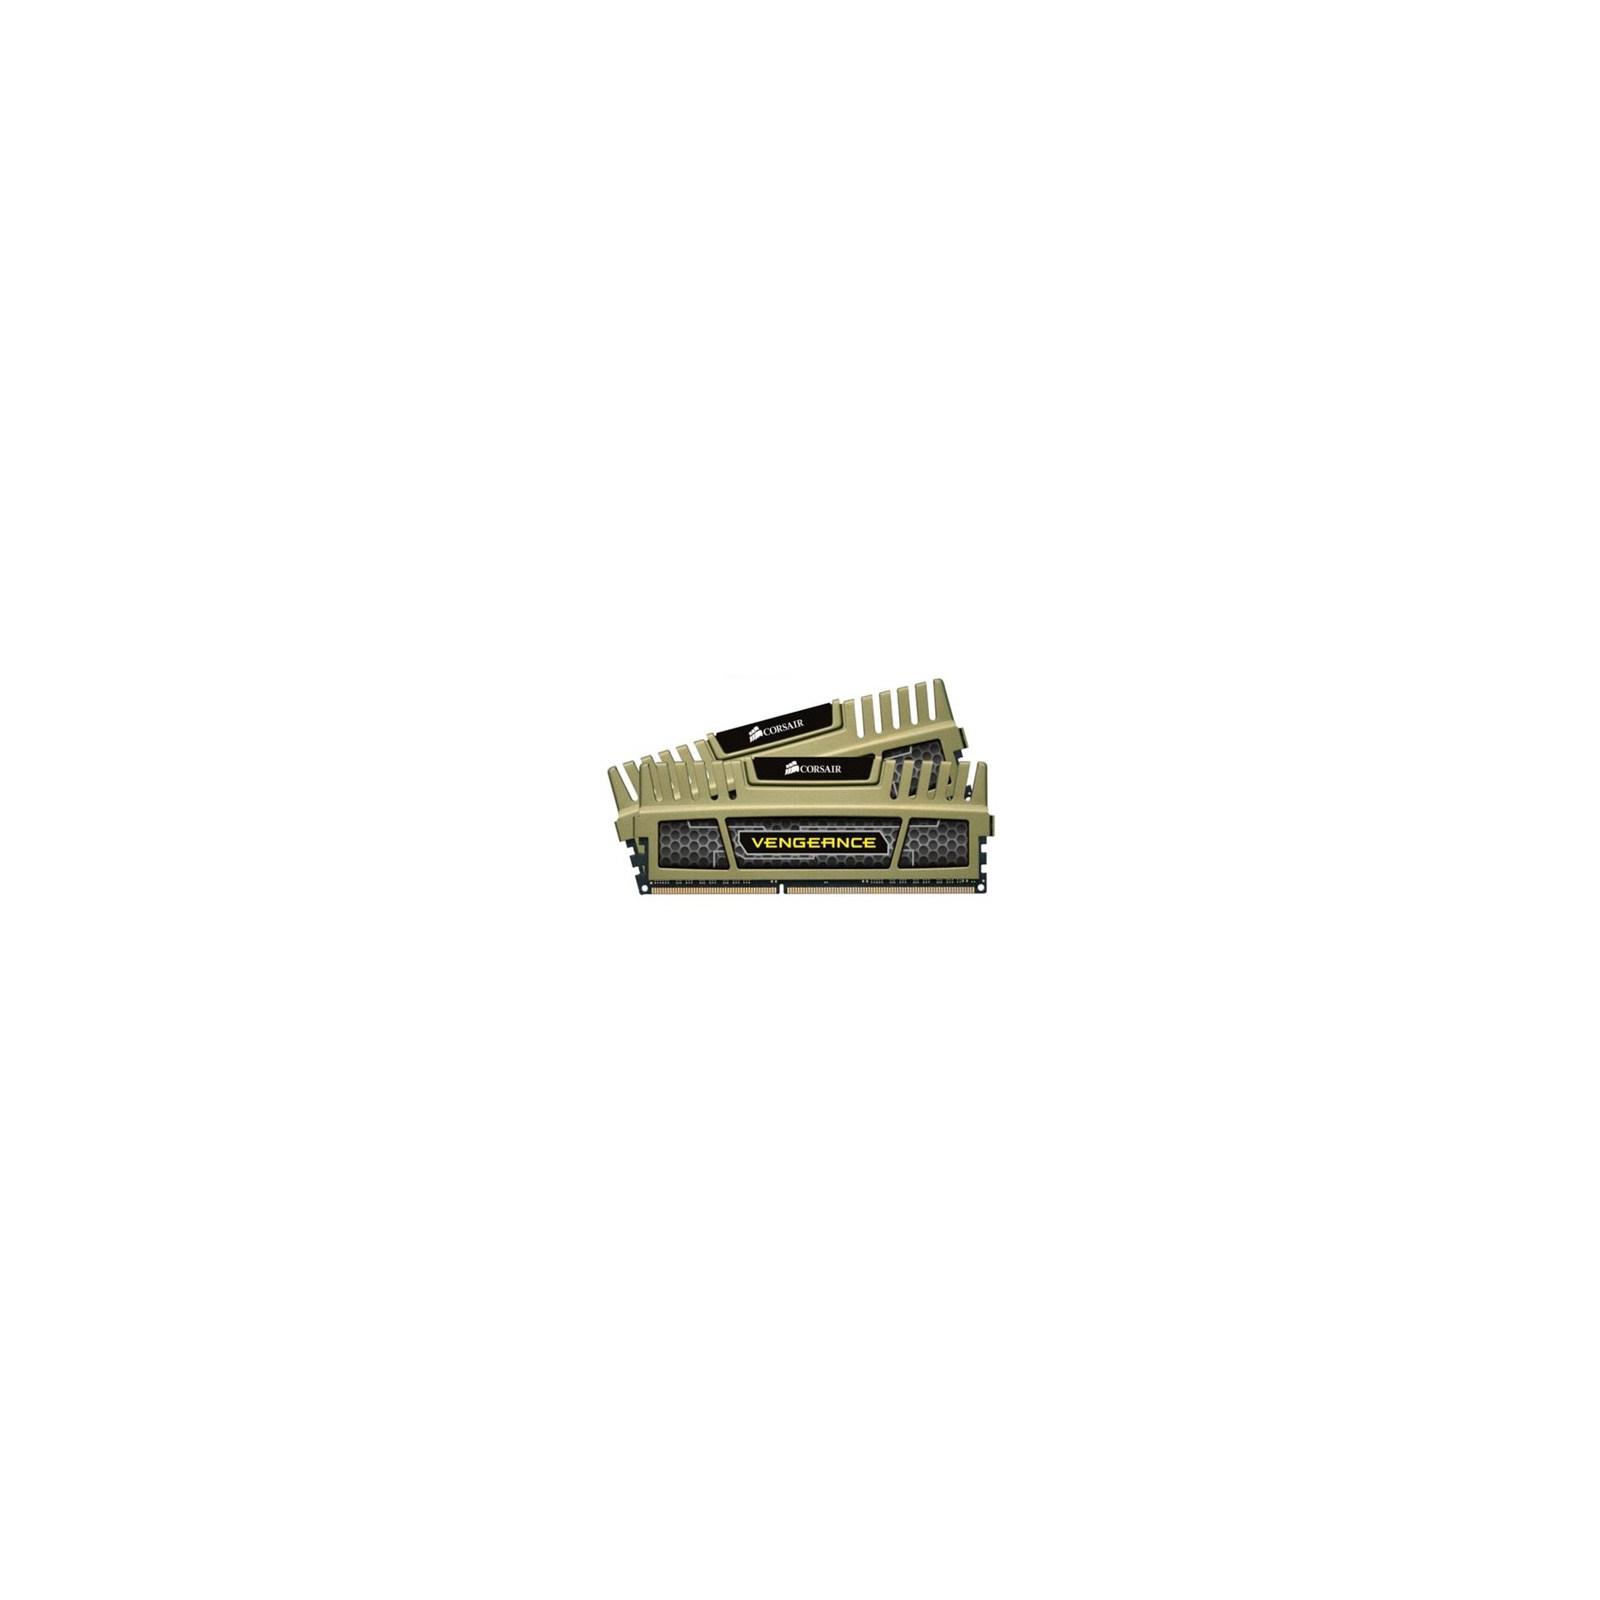 Модуль памяти для компьютера DDR3 8GB (2x4GB) 1600 MHz CORSAIR (CMZ8GX3M2A1600C9G)